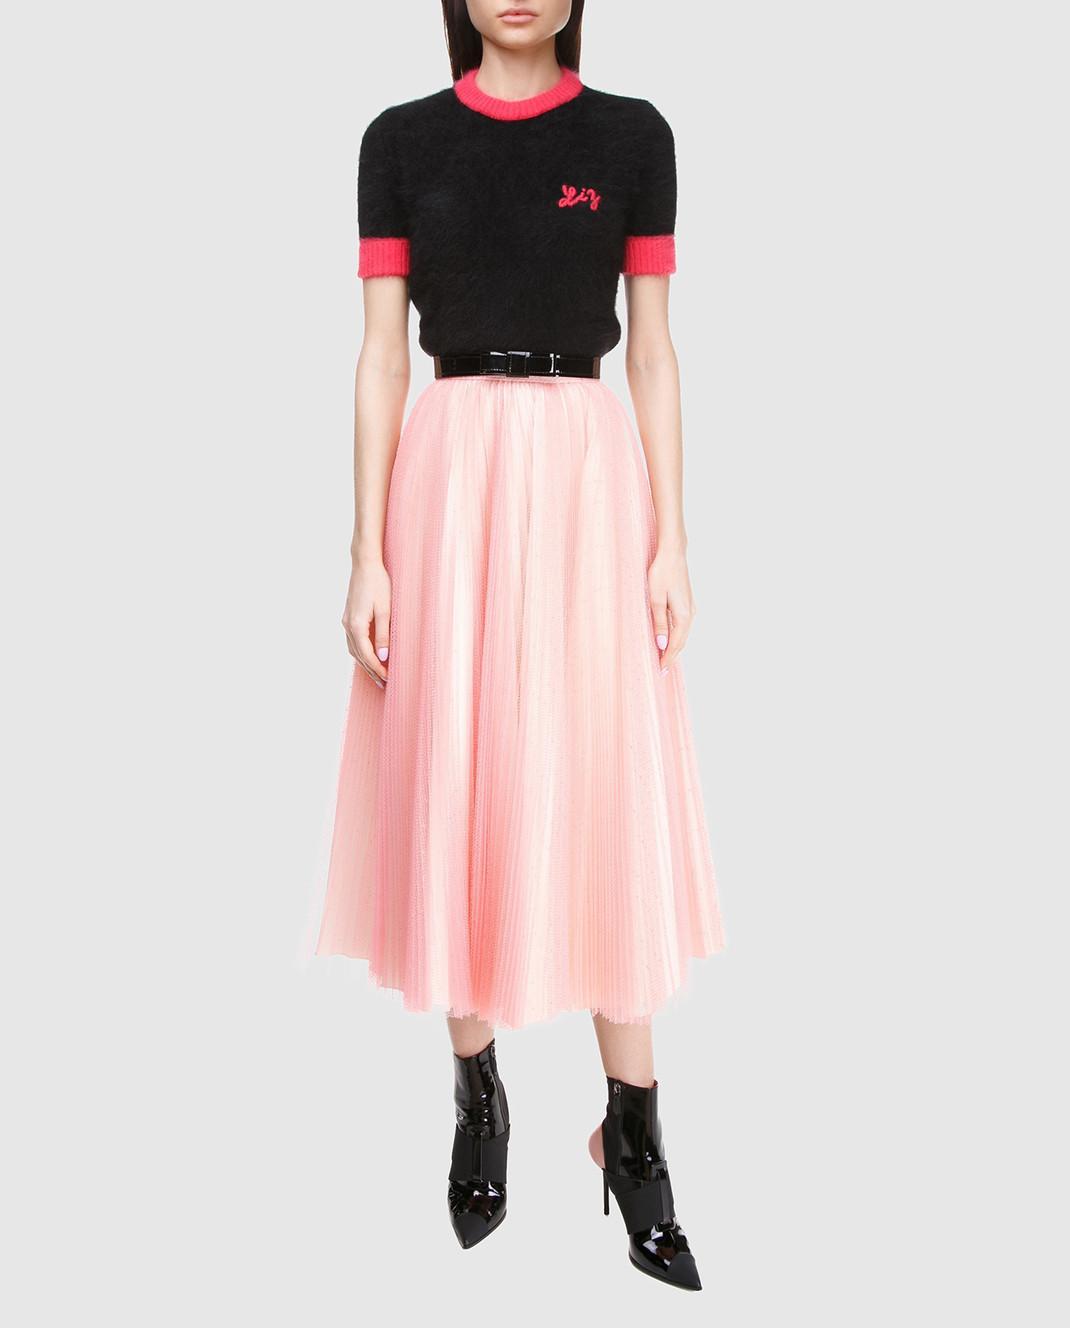 Philosophy di Lorenzo Serafini Розовая юбка V0126 изображение 2